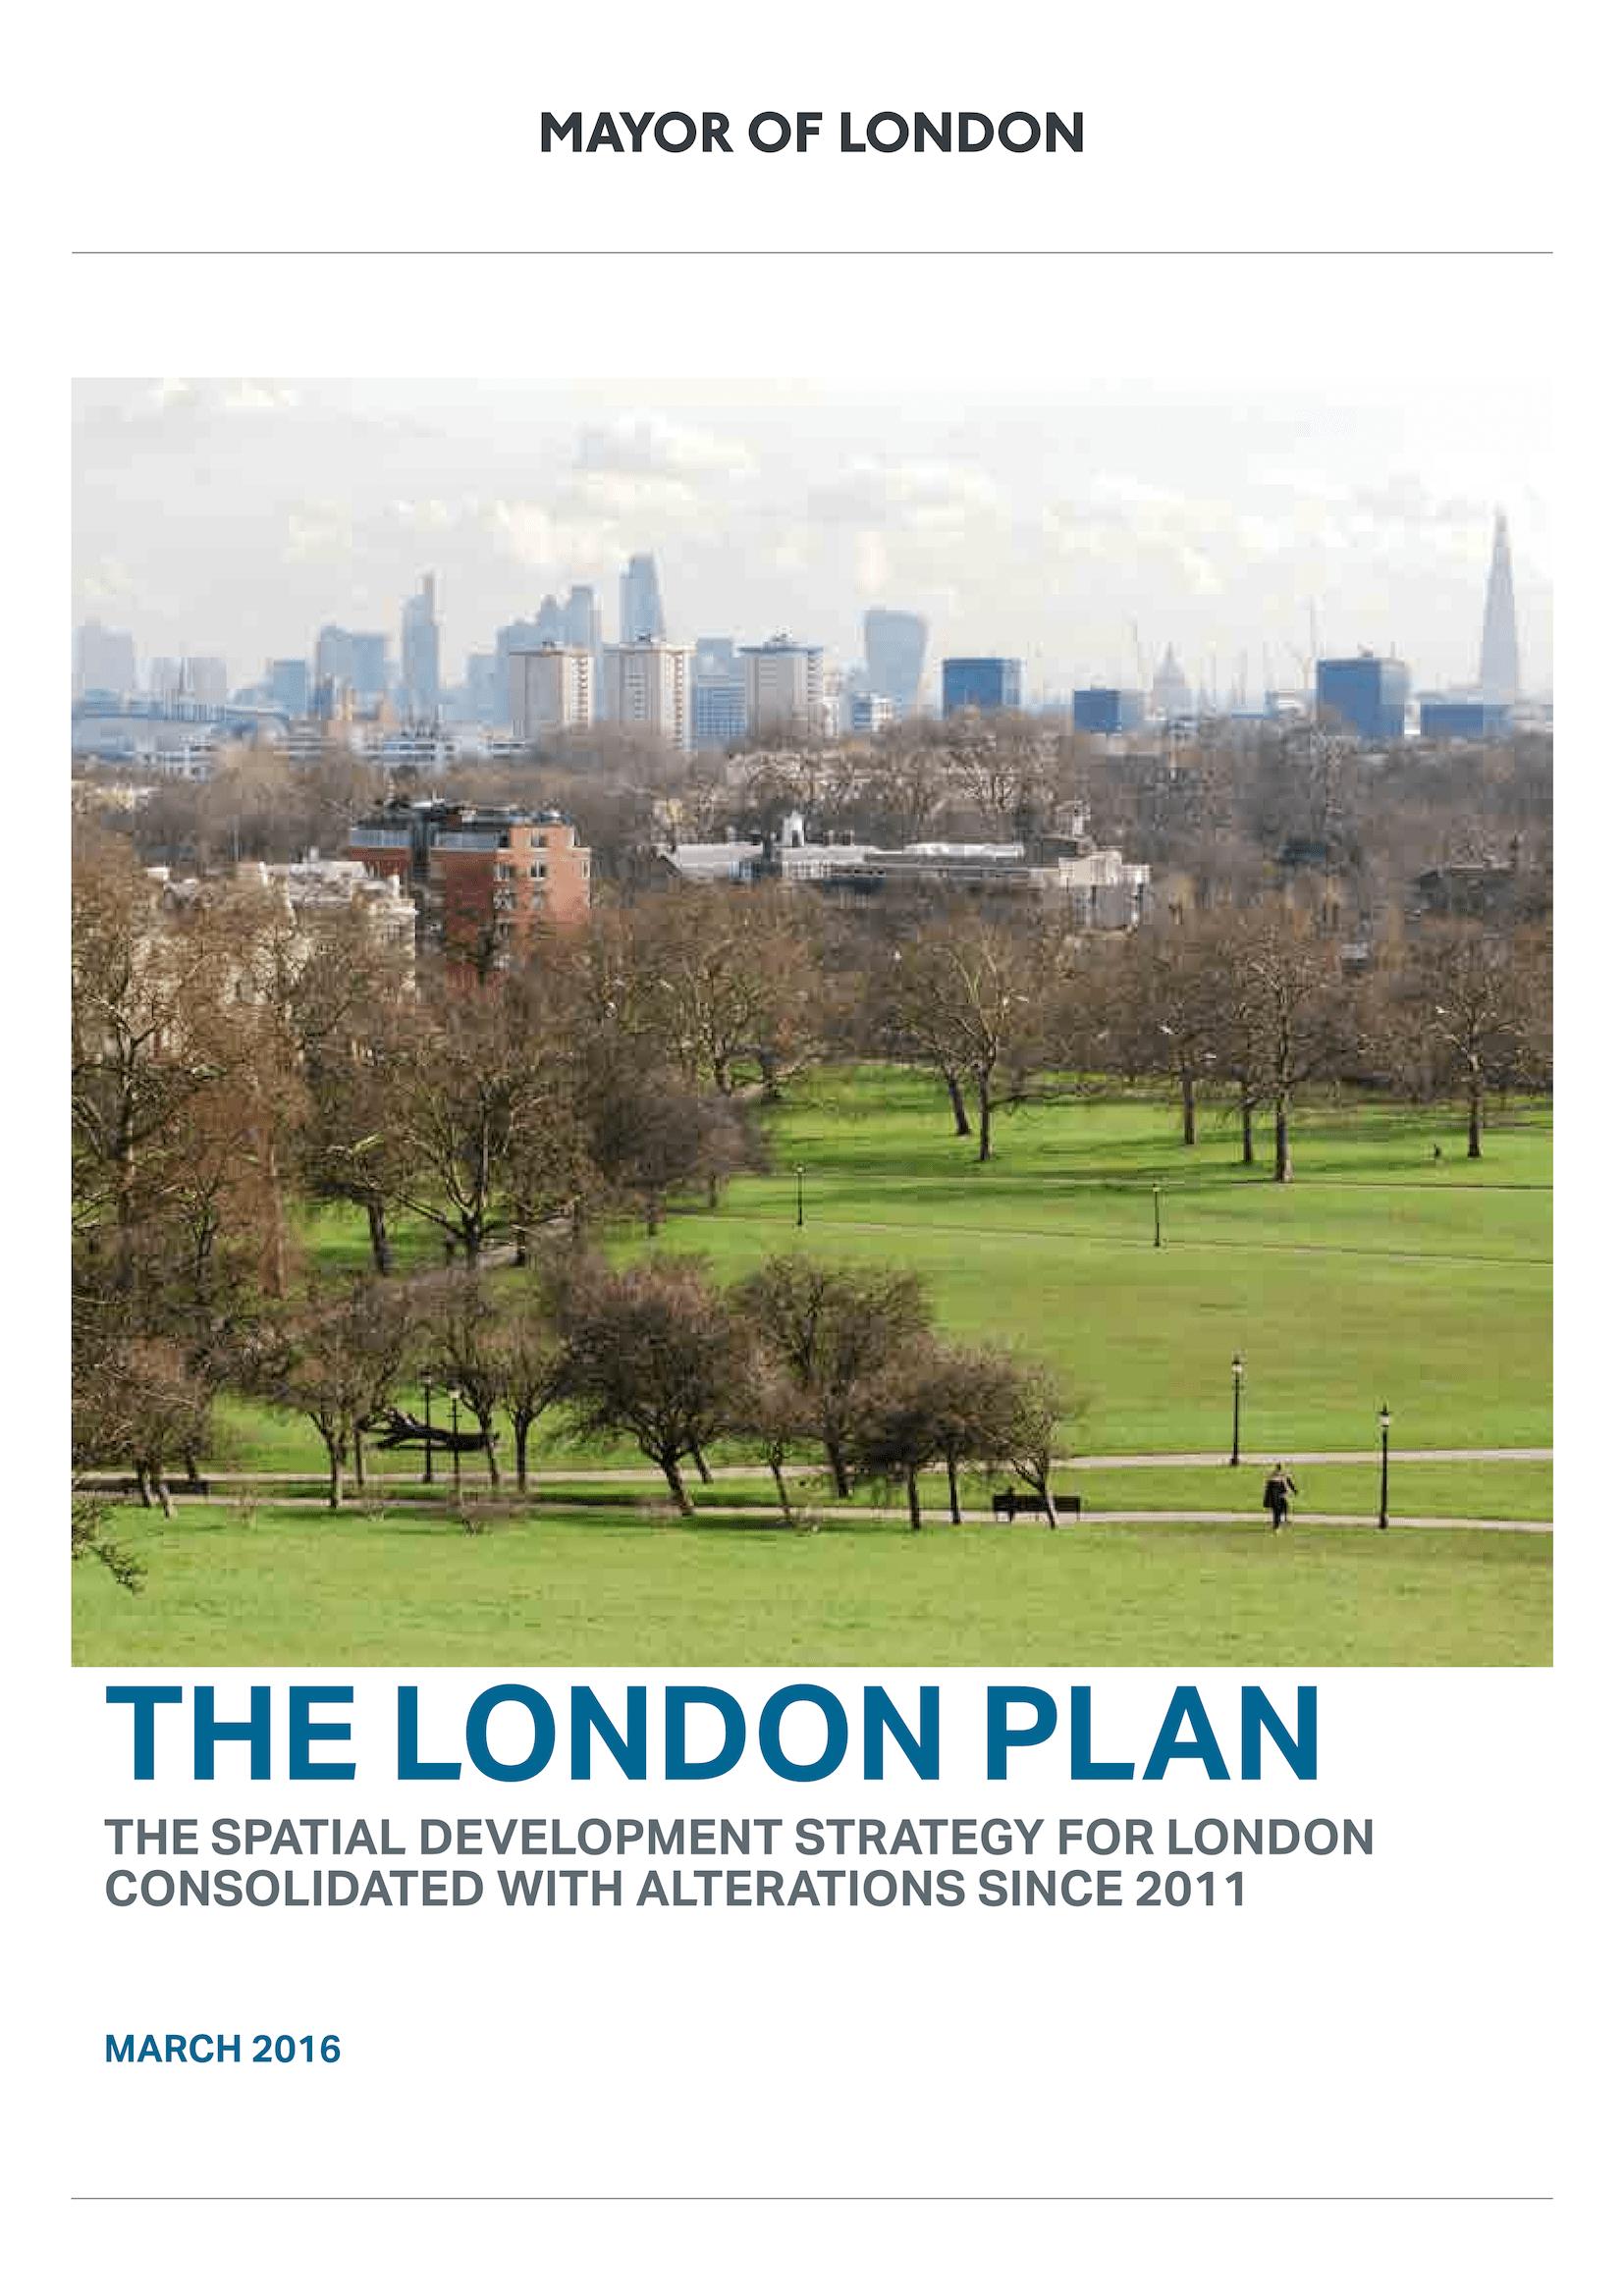 the_london_plan_malp_final_for_web_0606_0